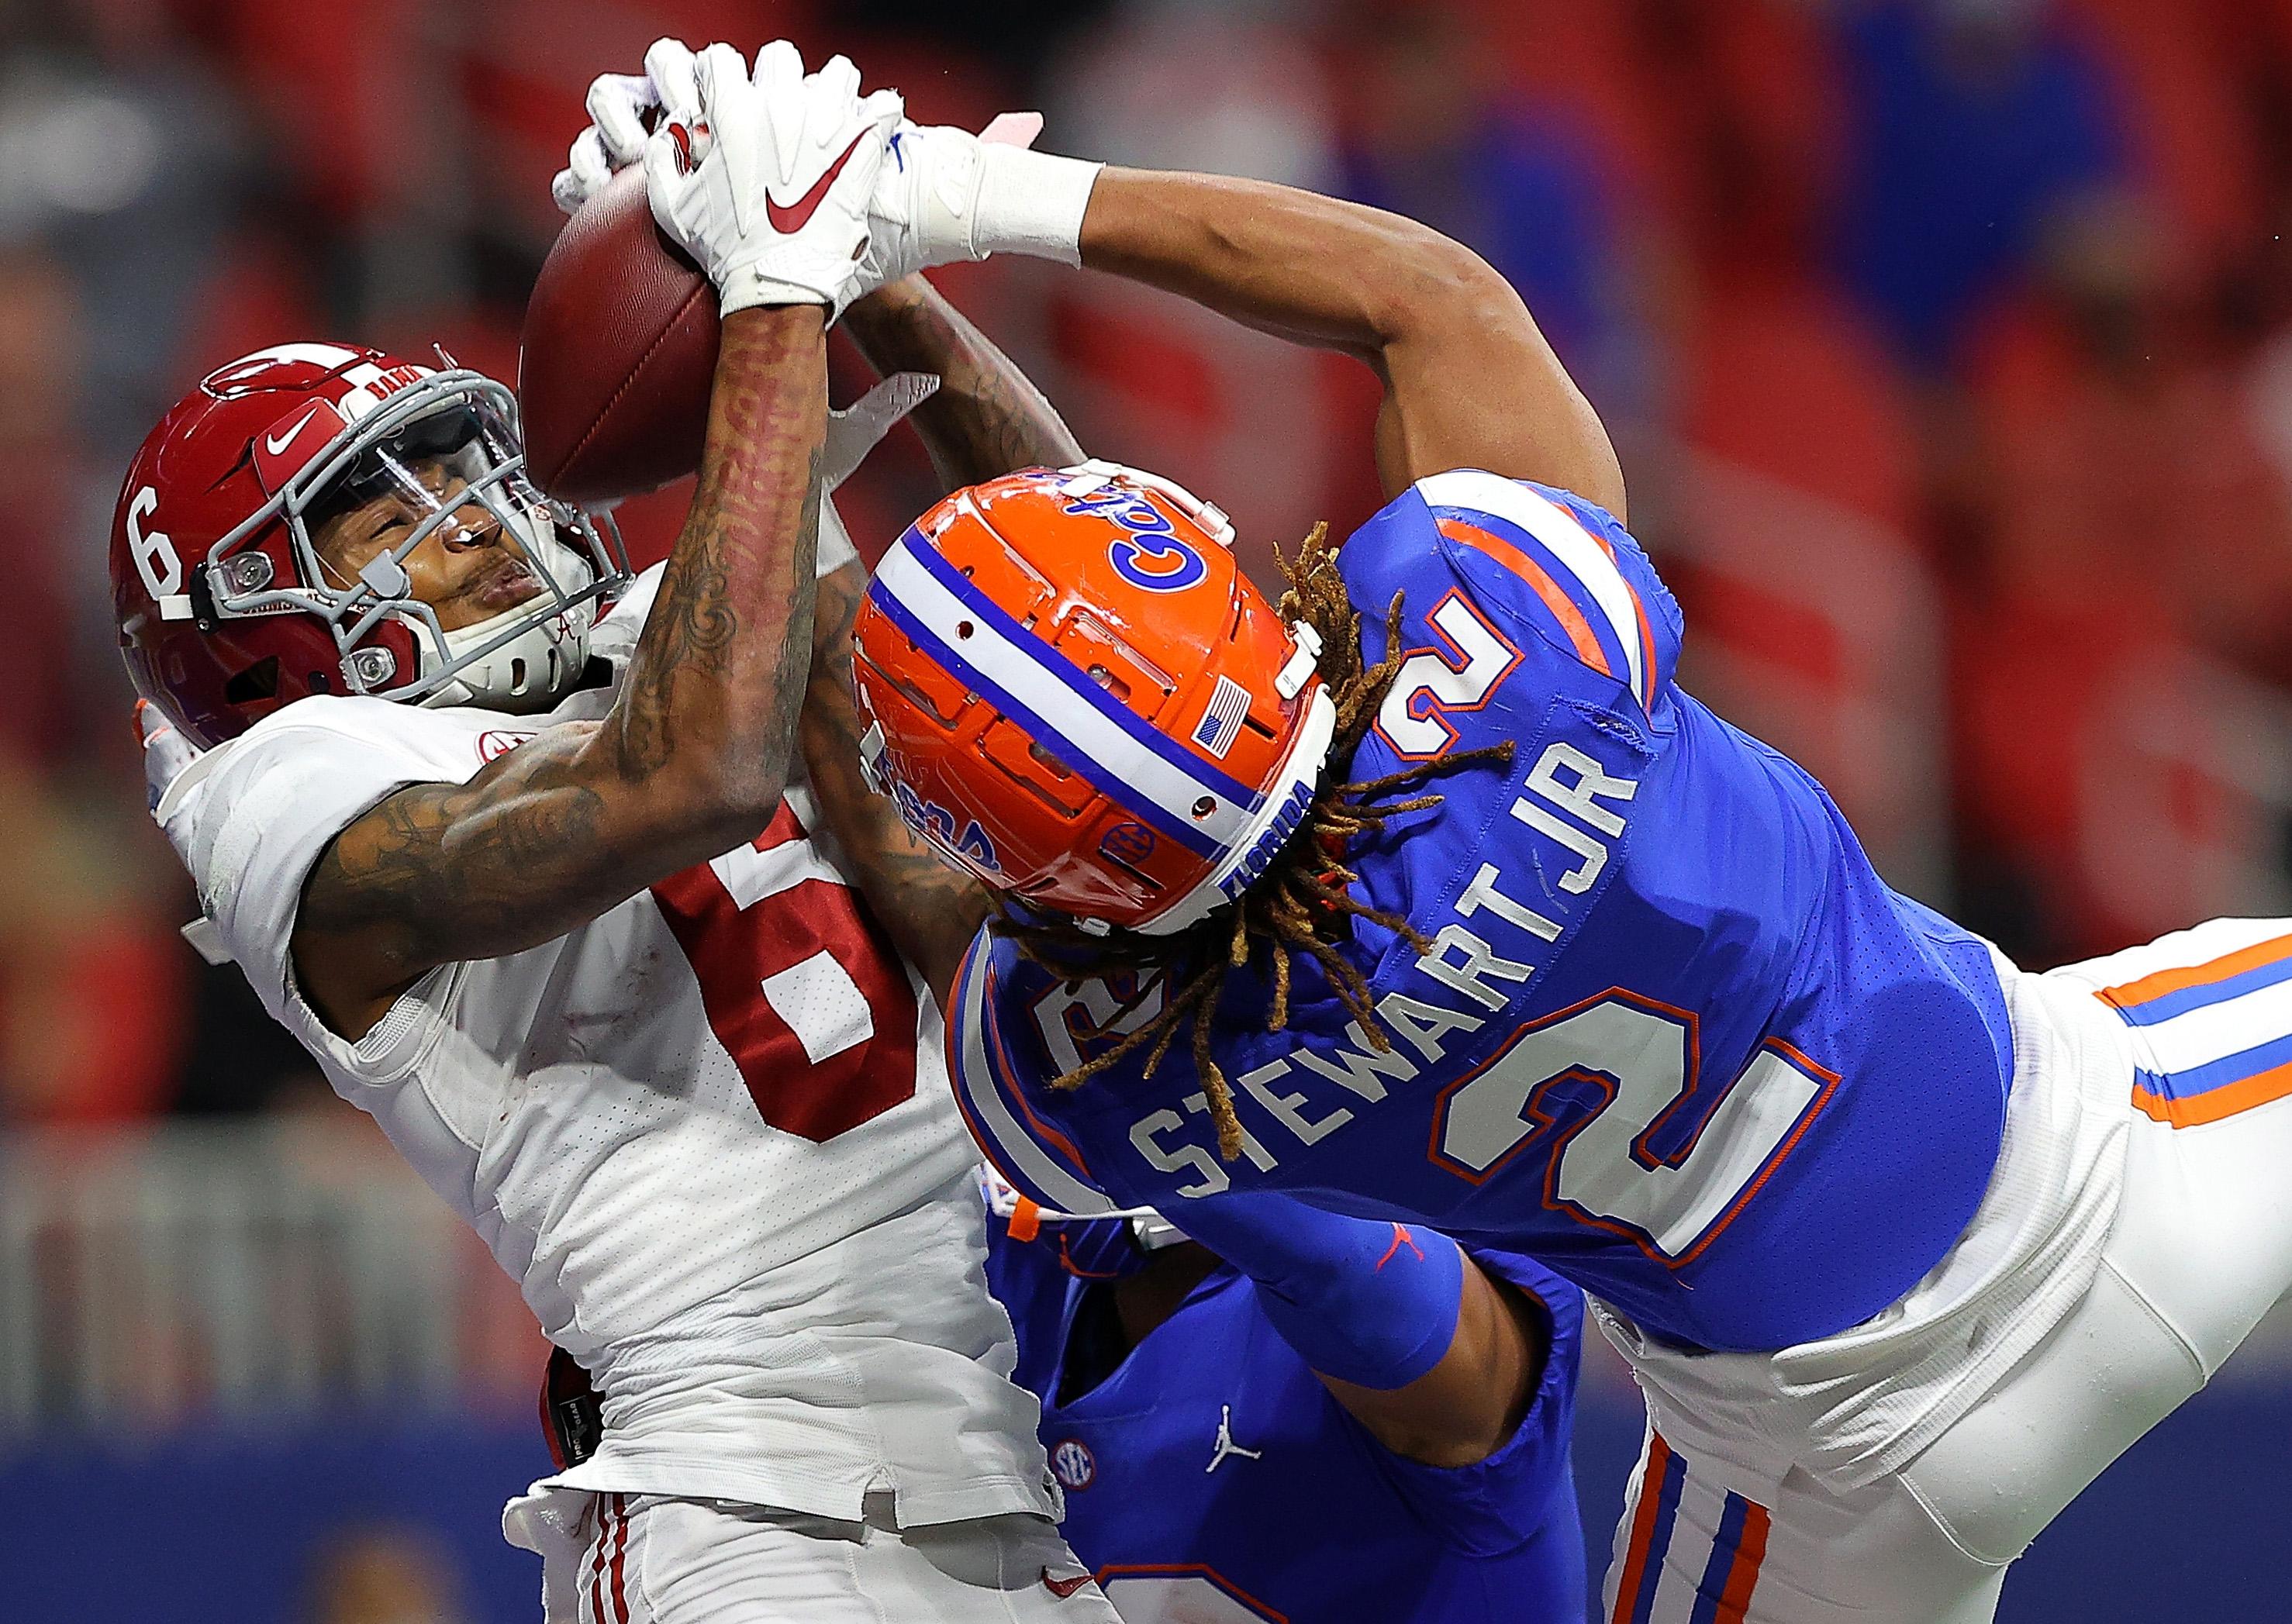 SEC Championship - Alabama v Florida